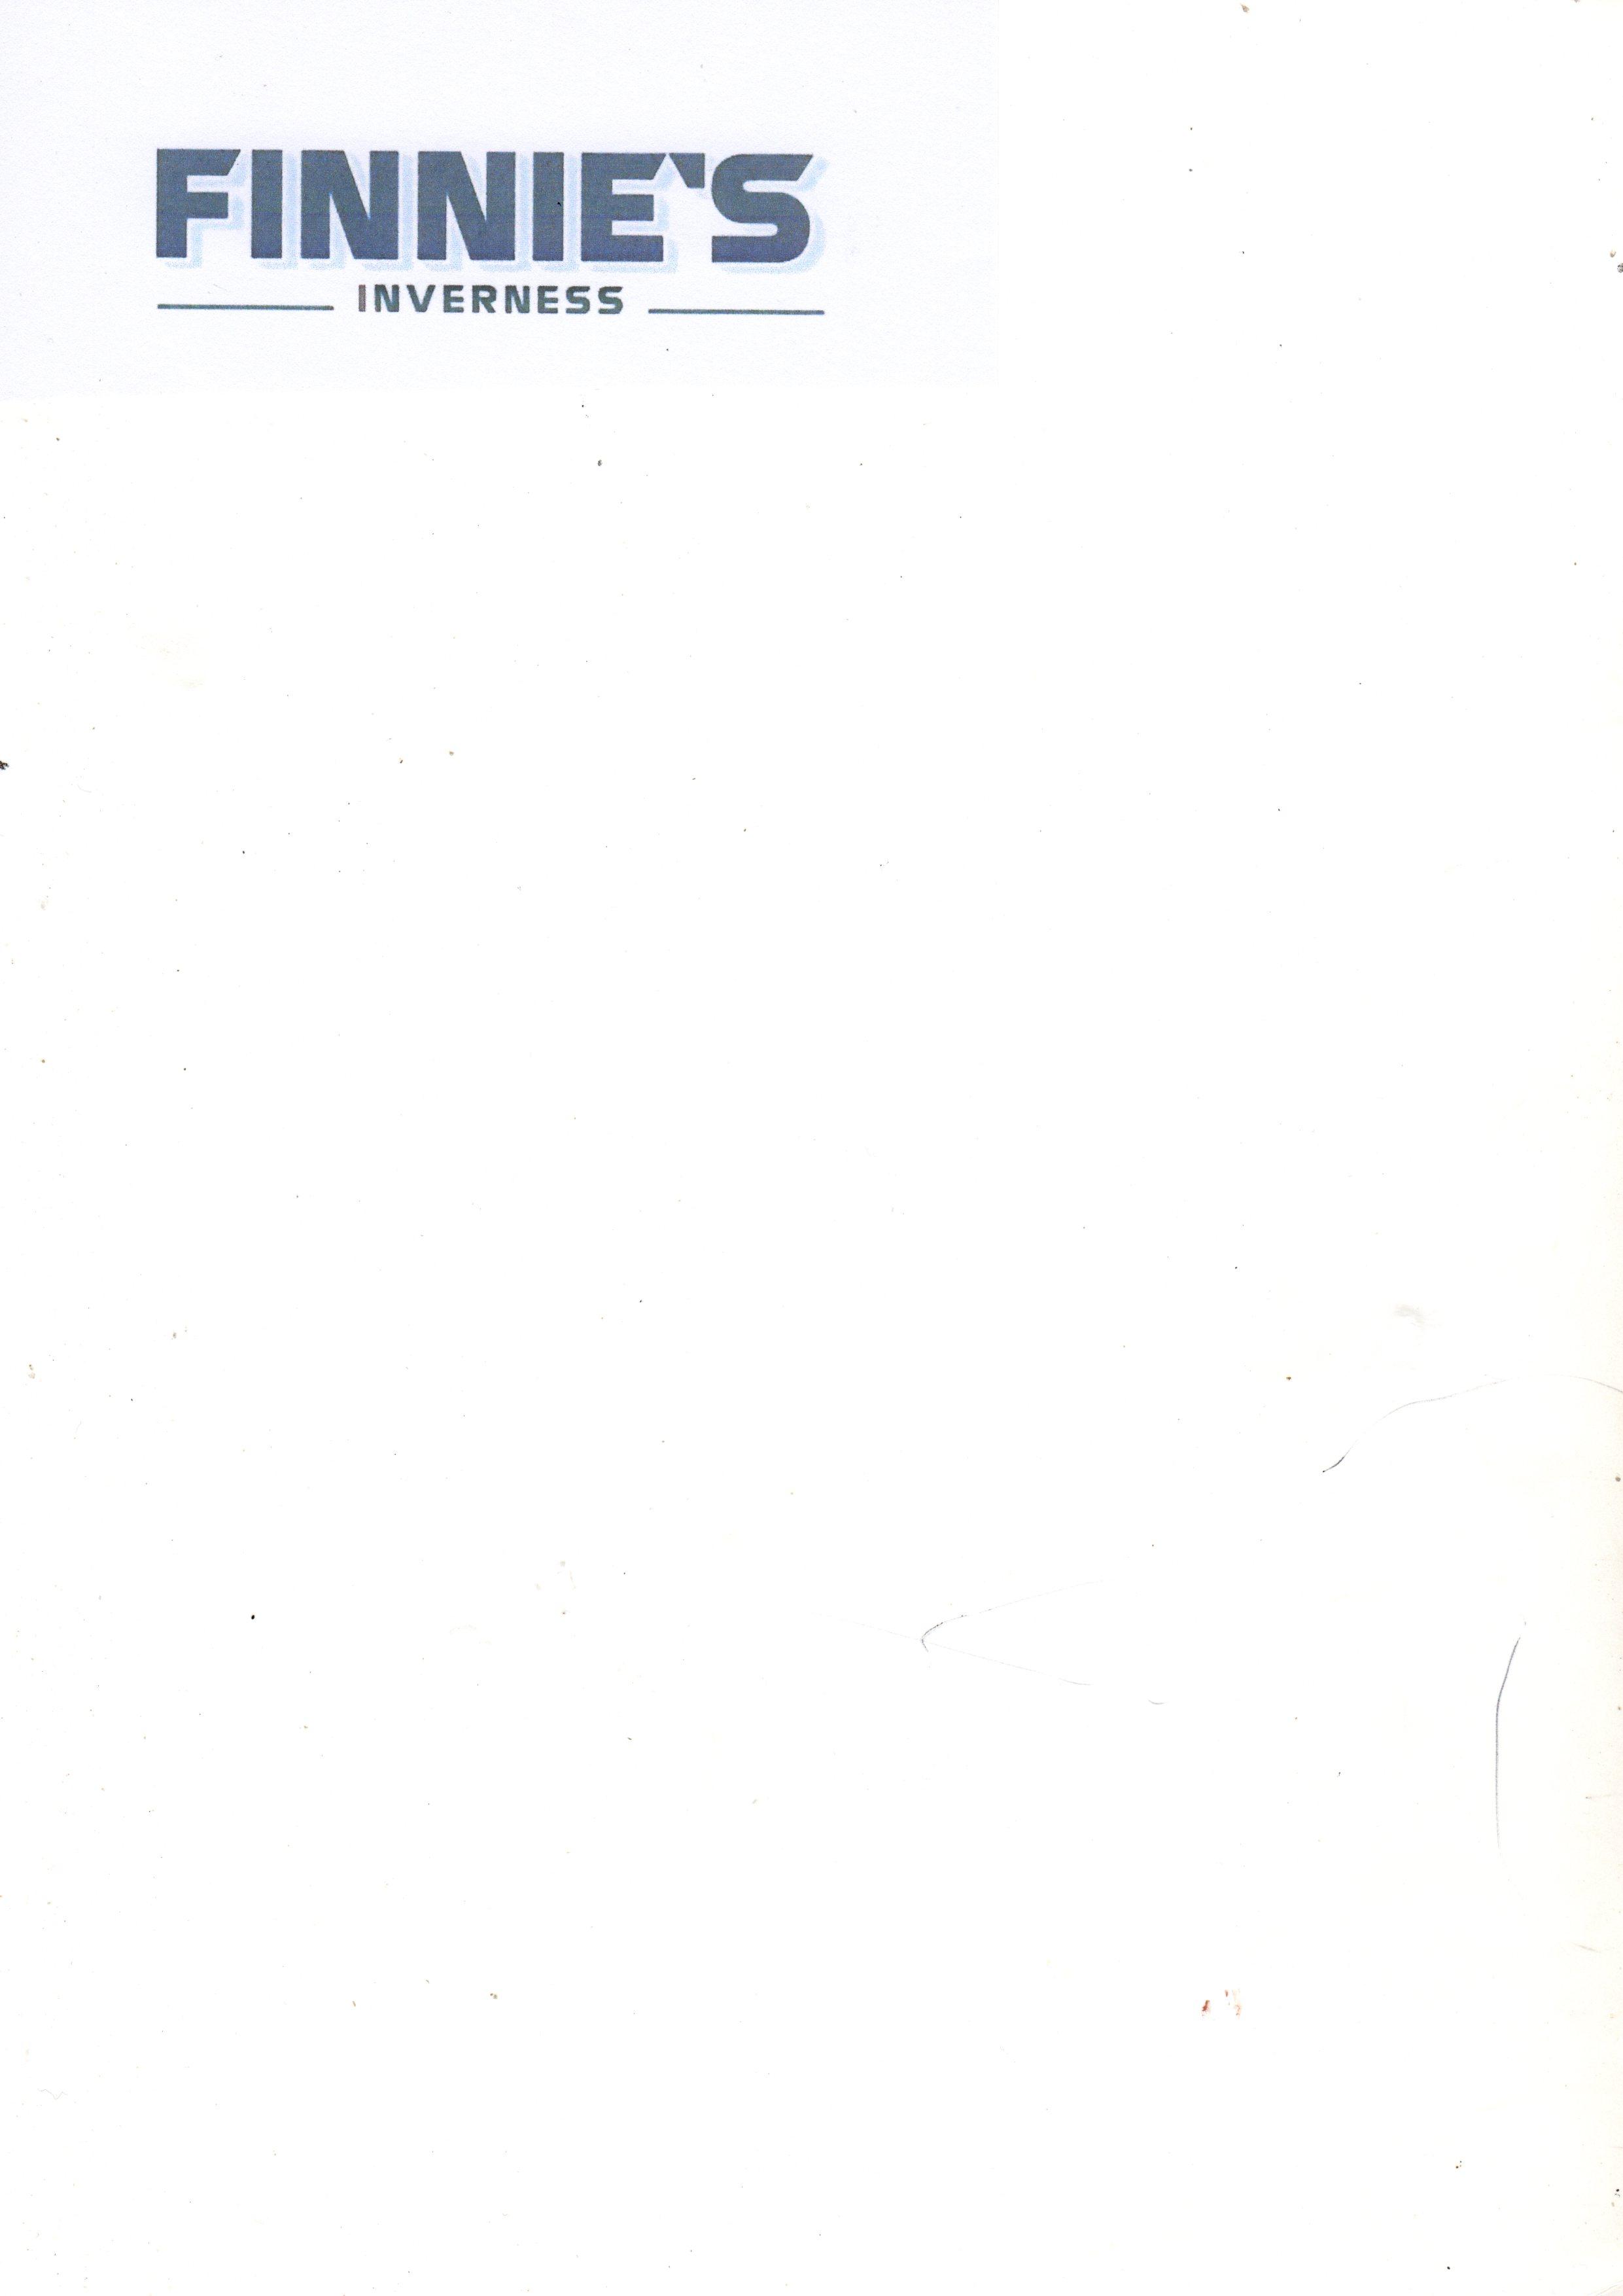 R FINNIE SKIPHIRE - INVERNESS, Inverness-Shire IV1 1SU - 01463 713637 | ShowMeLocal.com